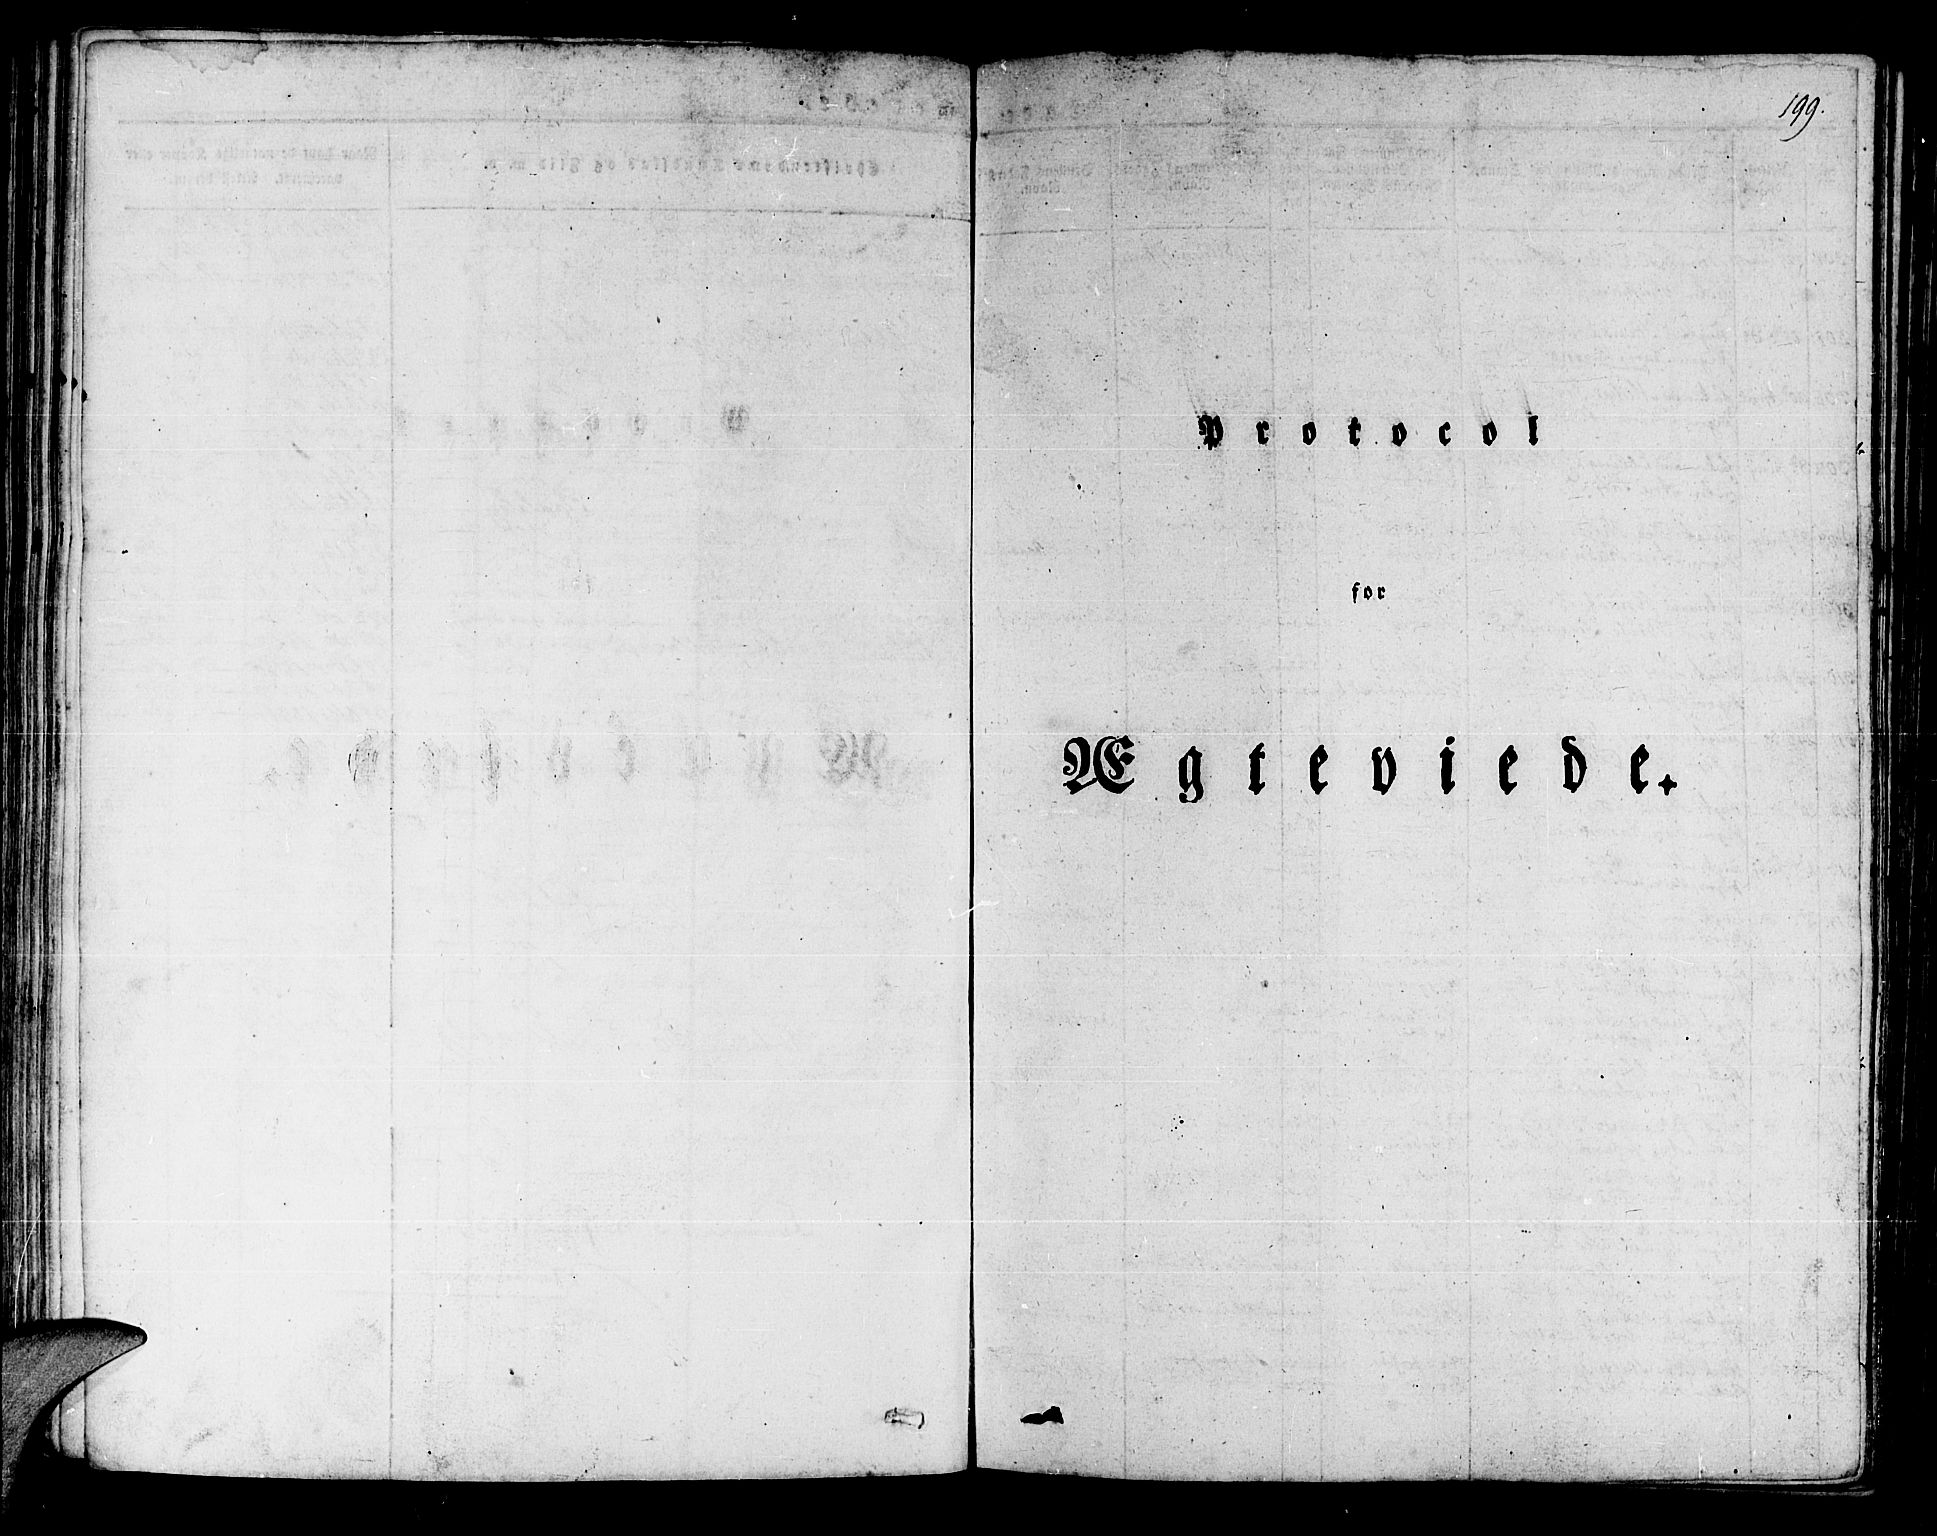 SAB, Manger sokneprestembete, H/Haa: Ministerialbok nr. A 4, 1824-1838, s. 199